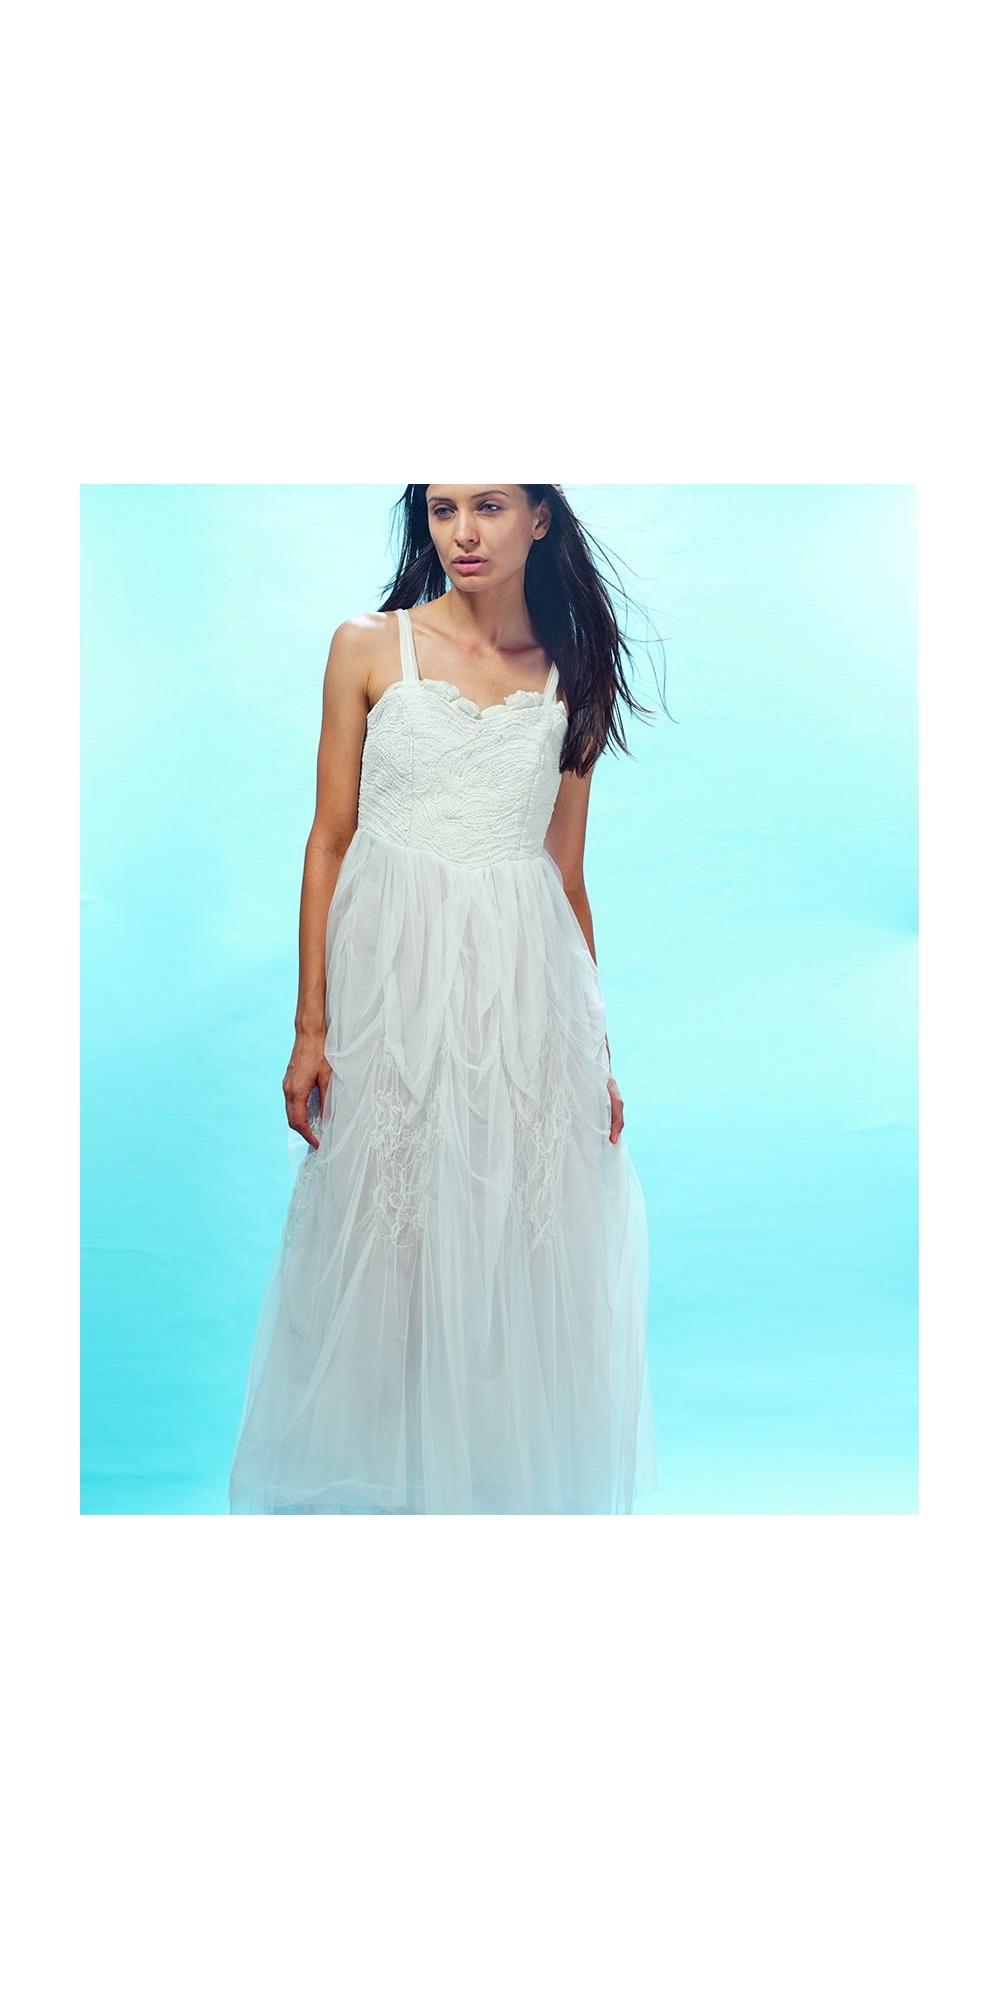 Stunning Ivory Party Dress Images - Wedding Ideas - memiocall.com